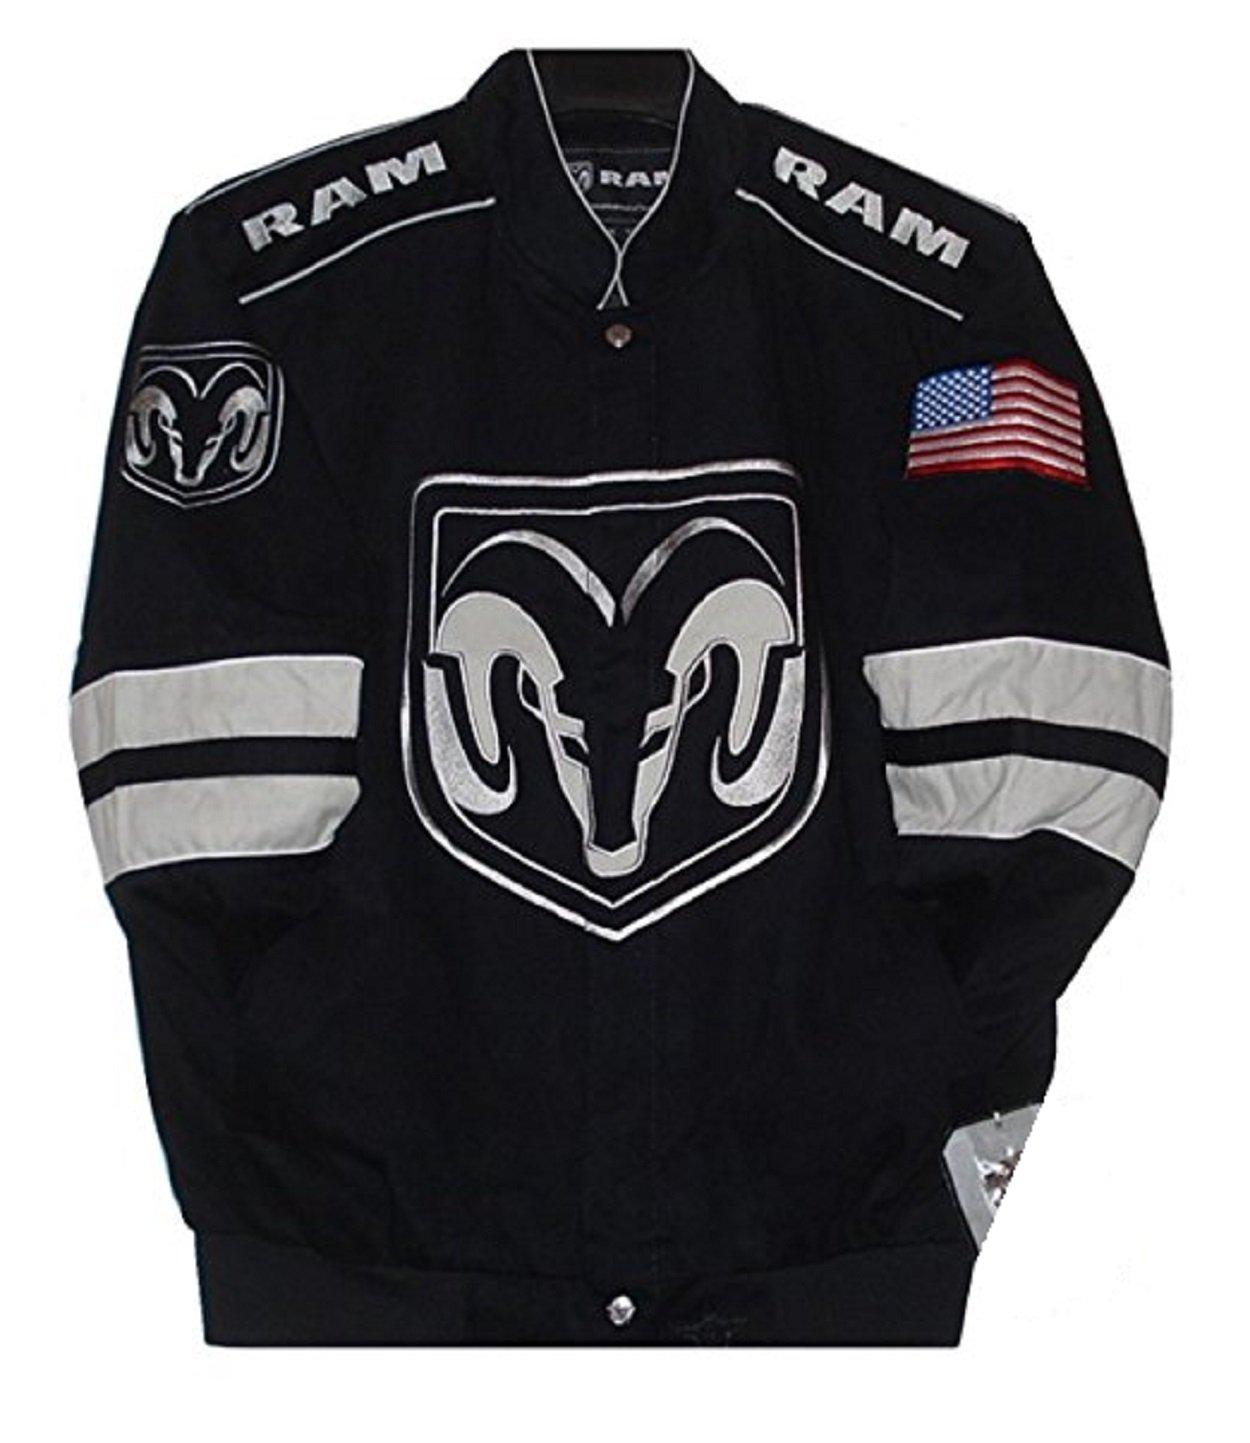 Dodge Ram Embroidered Cotton Twill Jacket Size 2XLarge